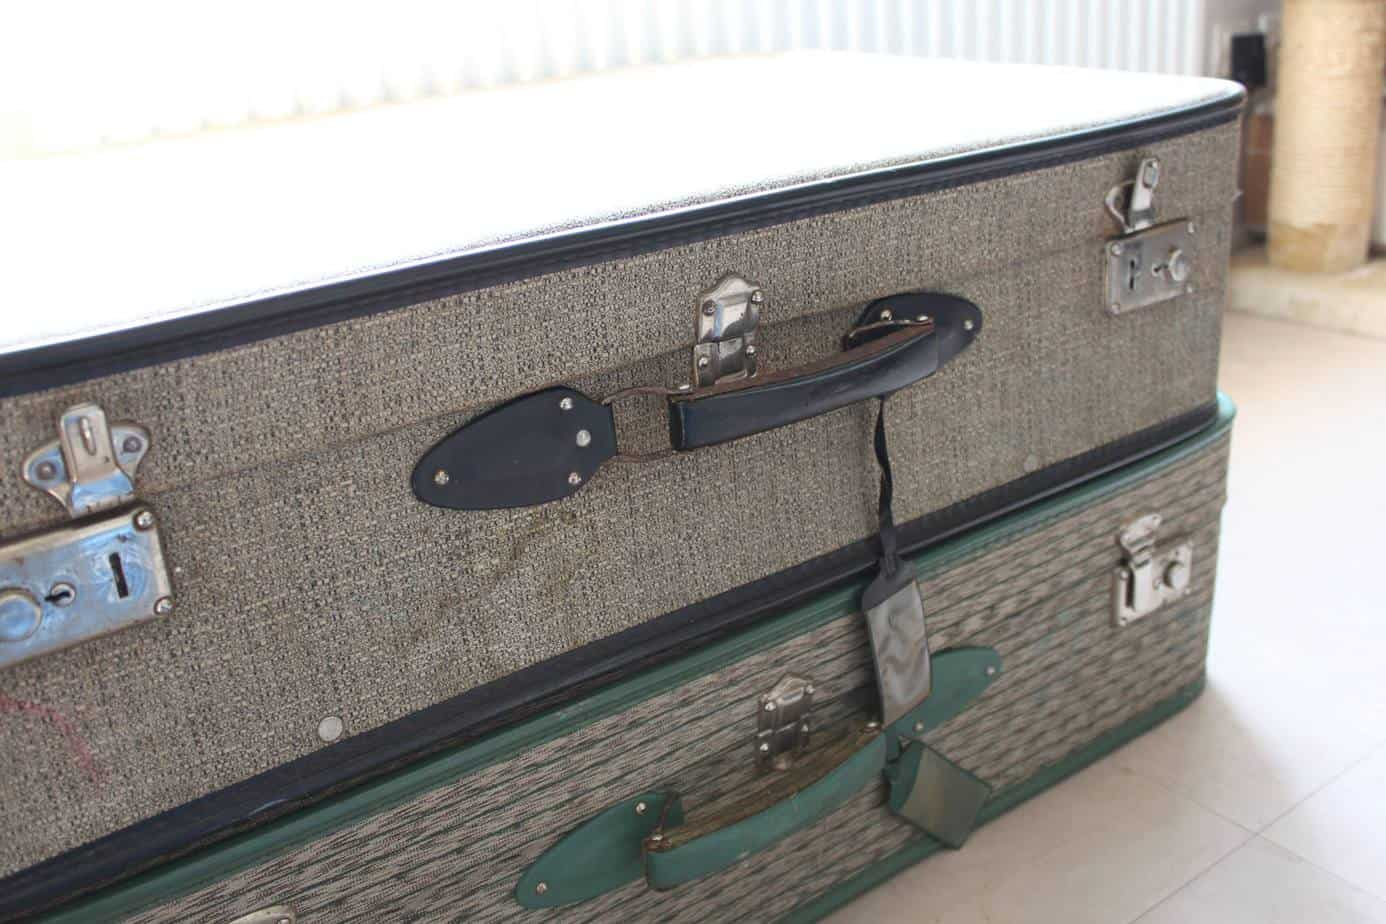 customiser valise ancienne vieille valise avec malle ancienne achat vente malle ancienne pas. Black Bedroom Furniture Sets. Home Design Ideas